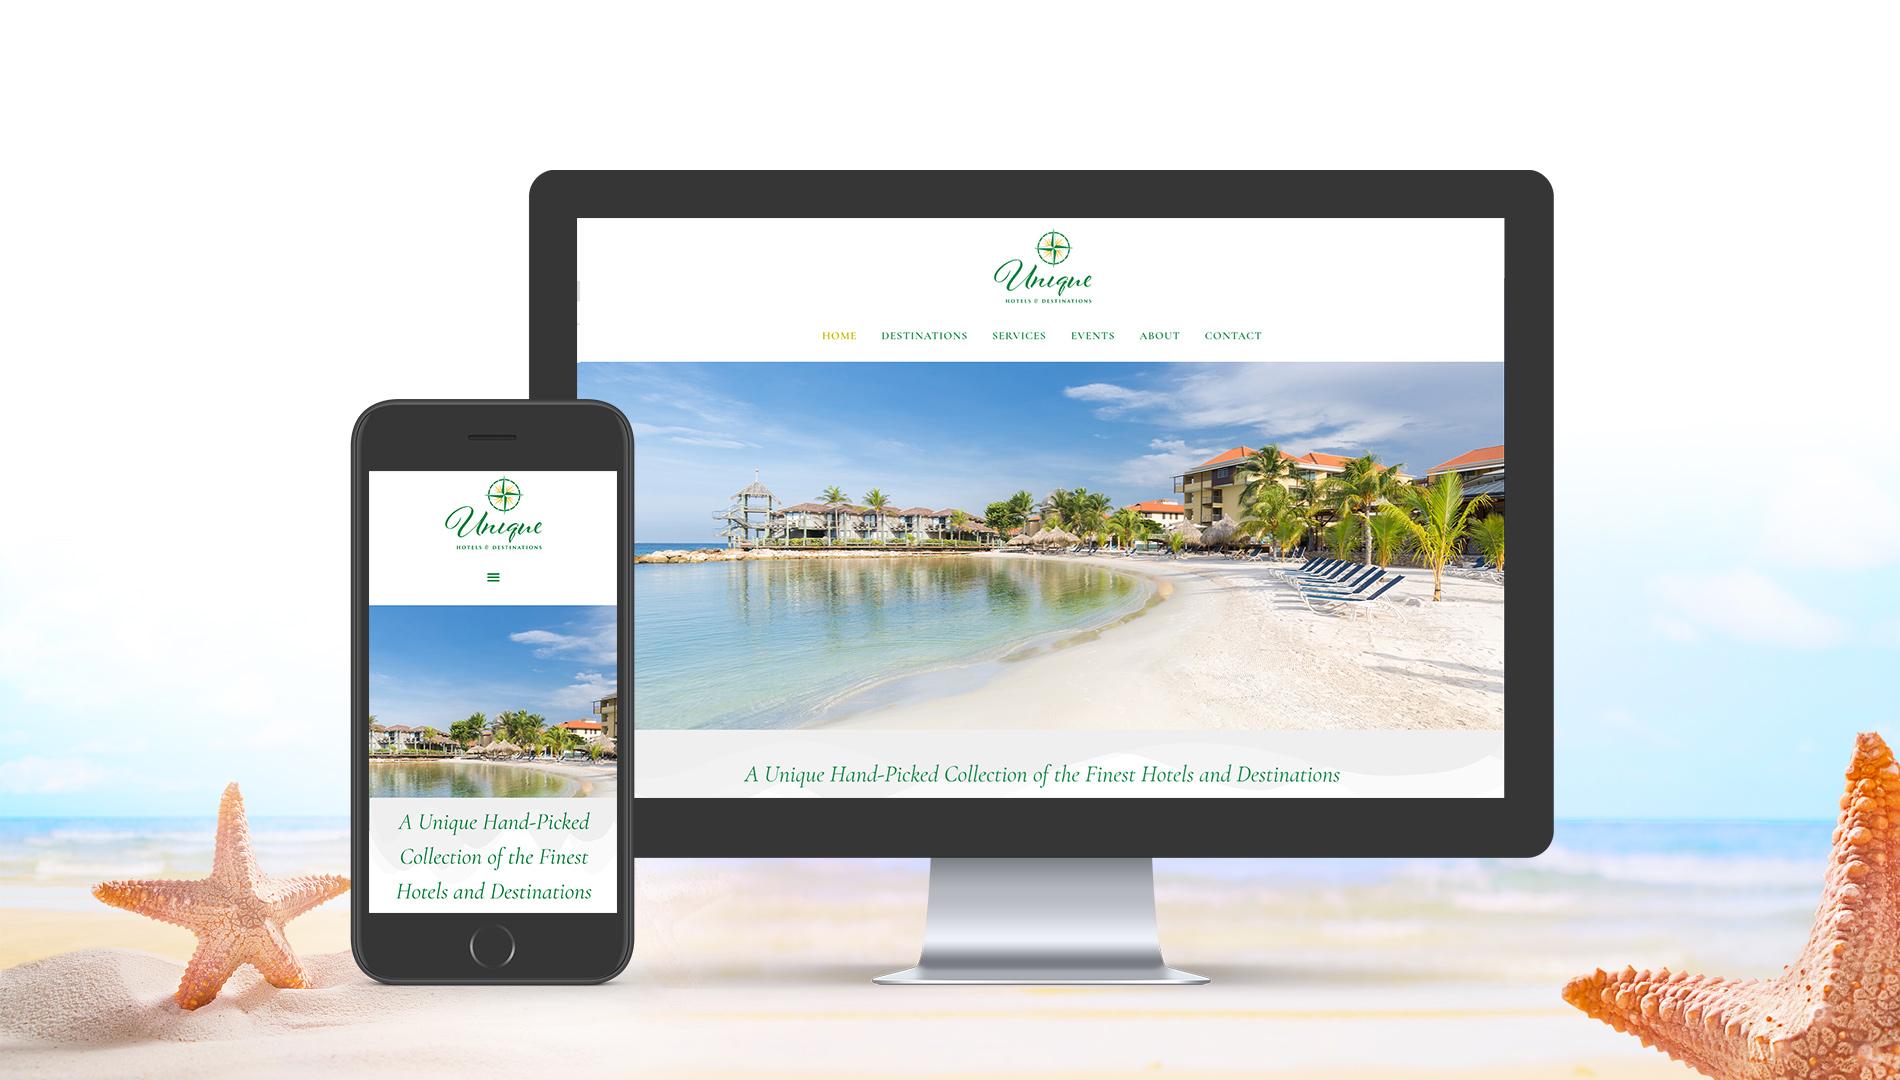 Unique Hotels and Destinations Website Design